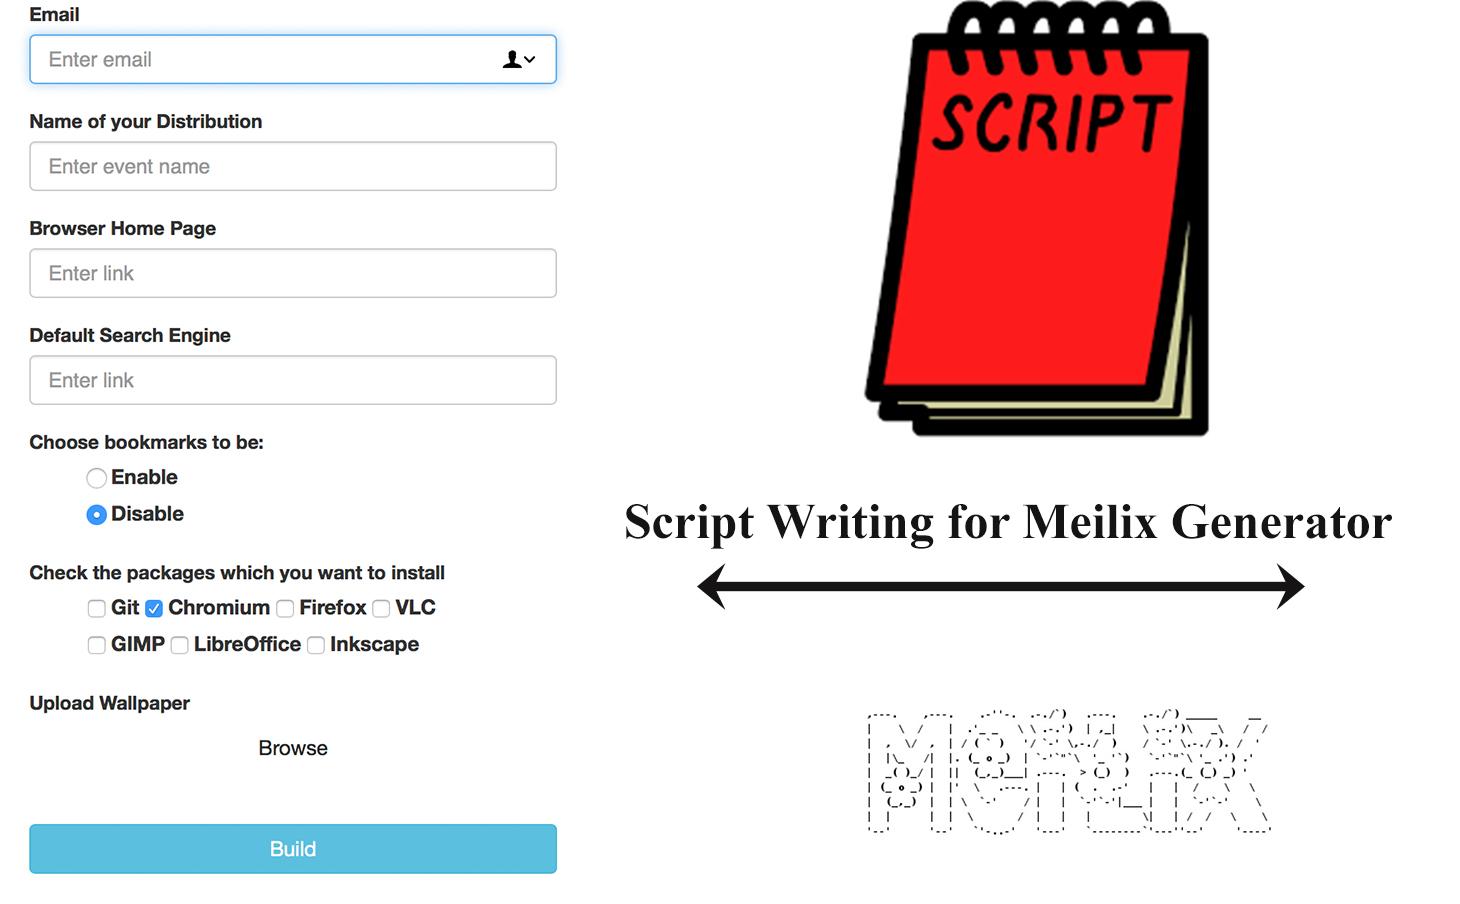 Adding Features into Meilix Generator Webapp